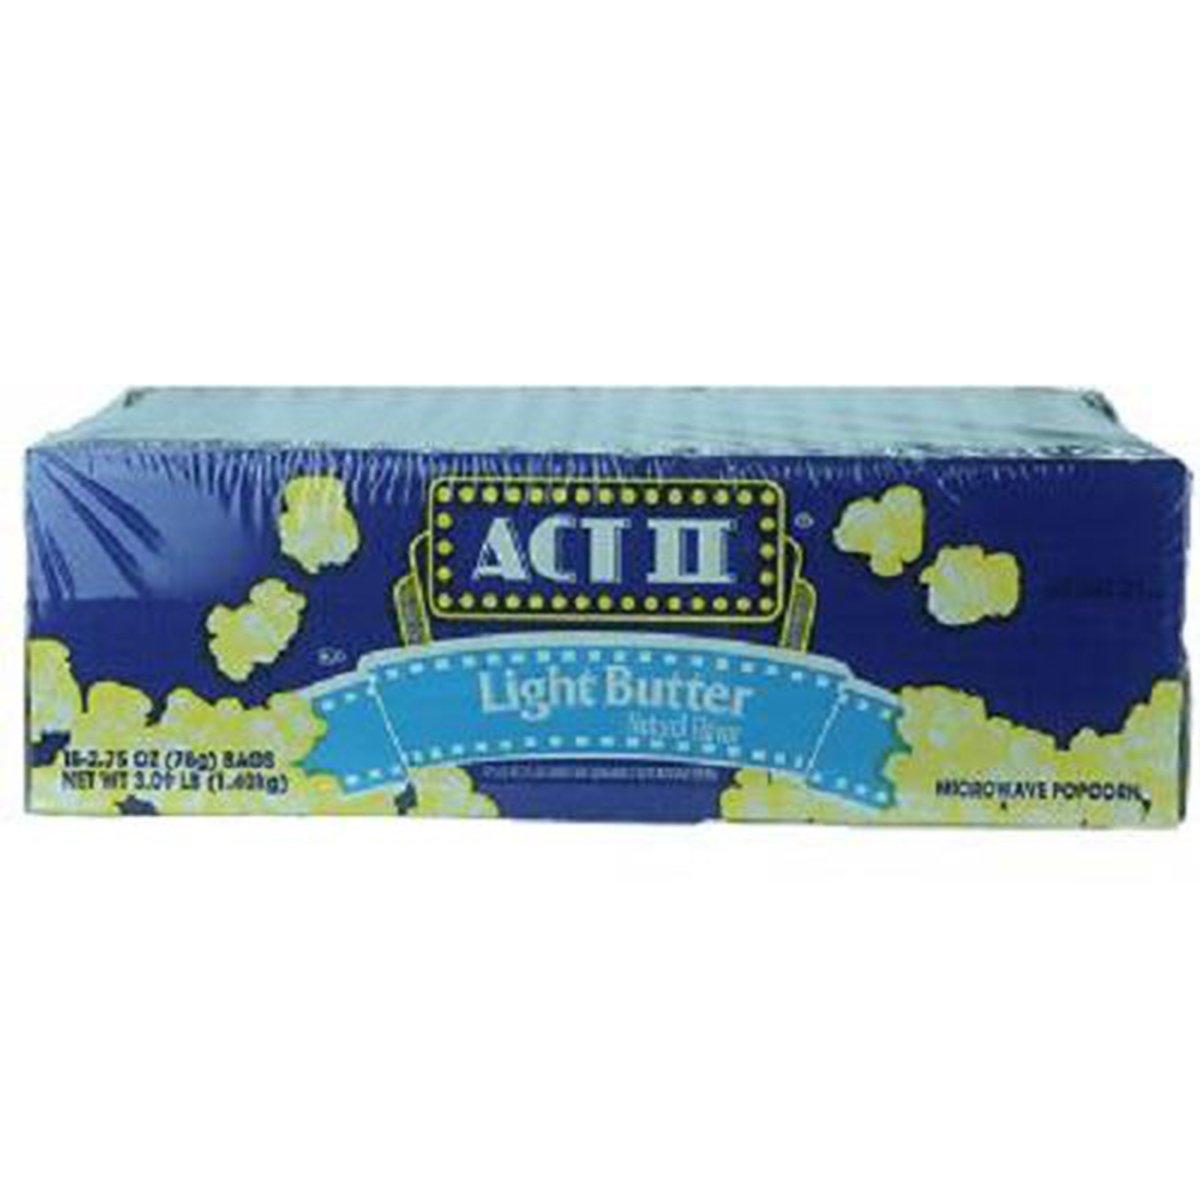 Product Of Act Ii, Popcorn Light Butter, Count 18 (2.75 oz) - Popcorn/Grab Varieties & Flavors